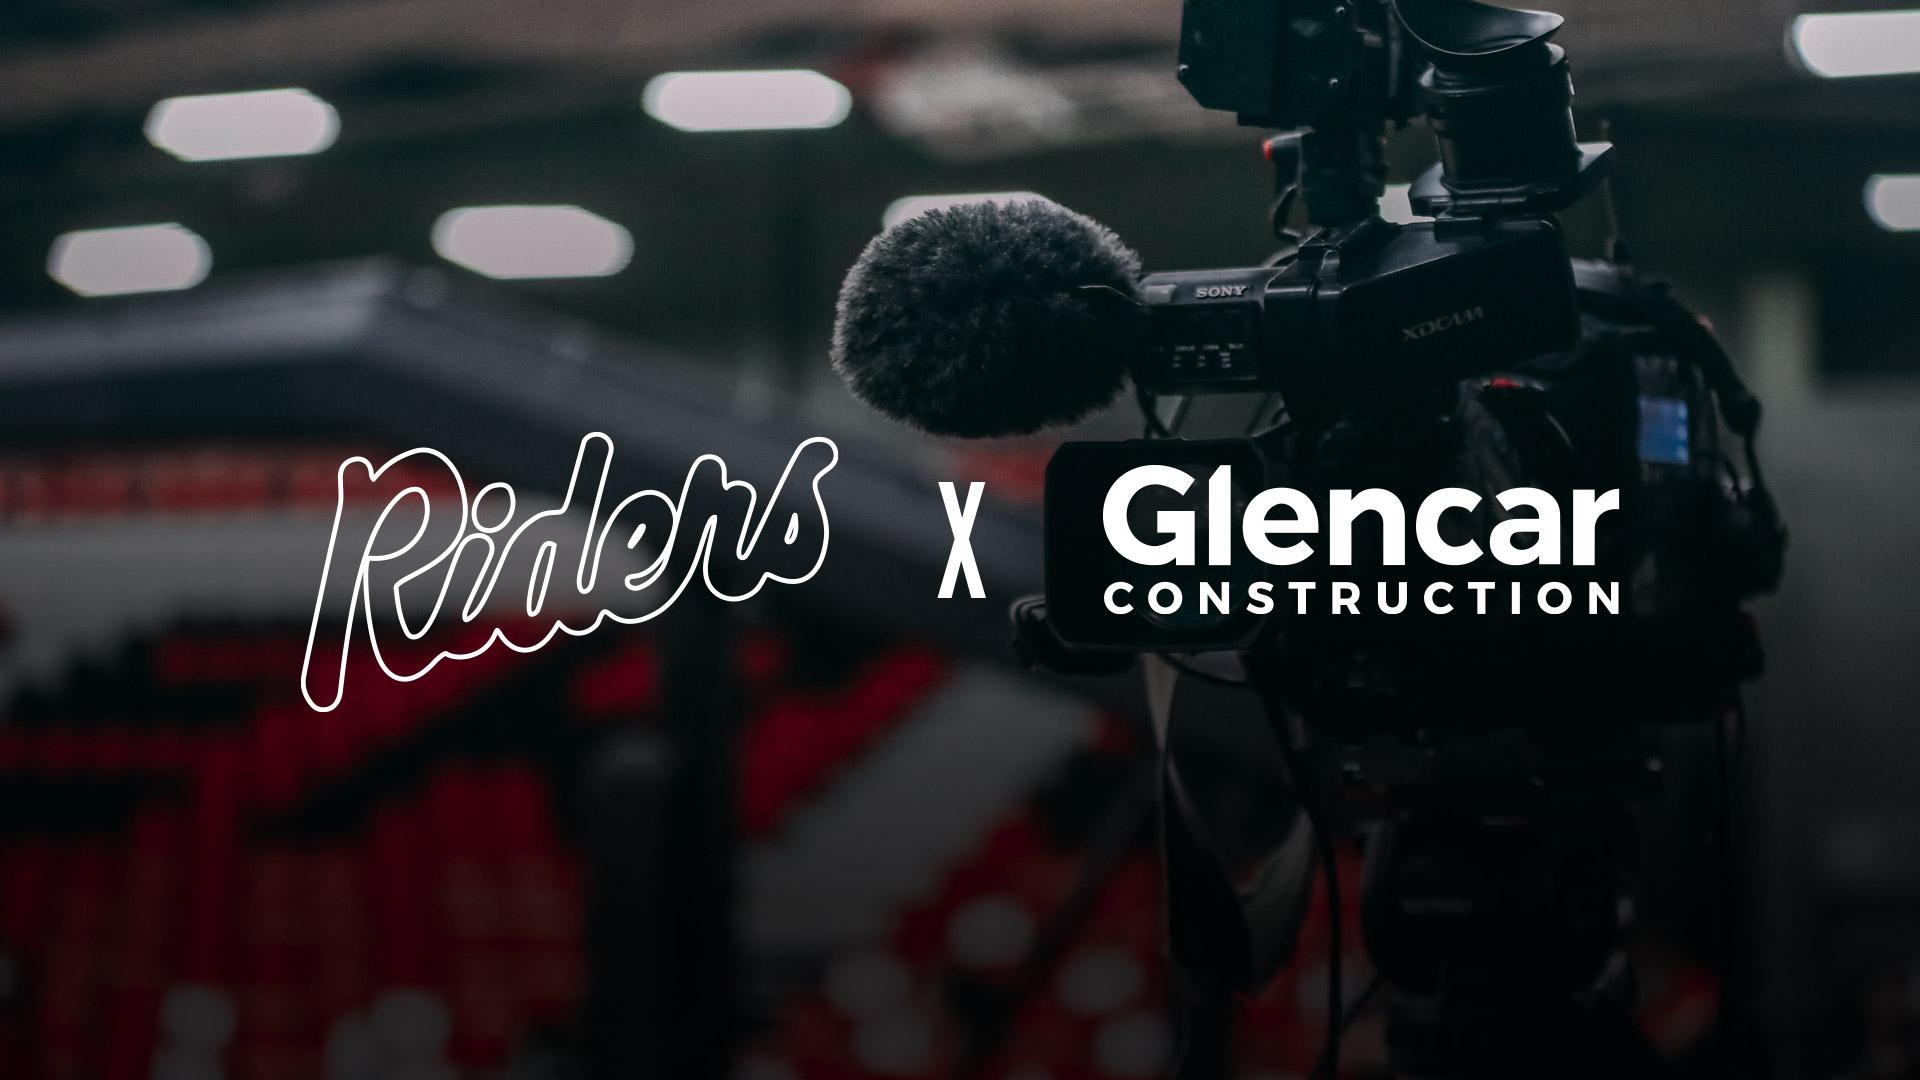 Glencar extends Riders partnership